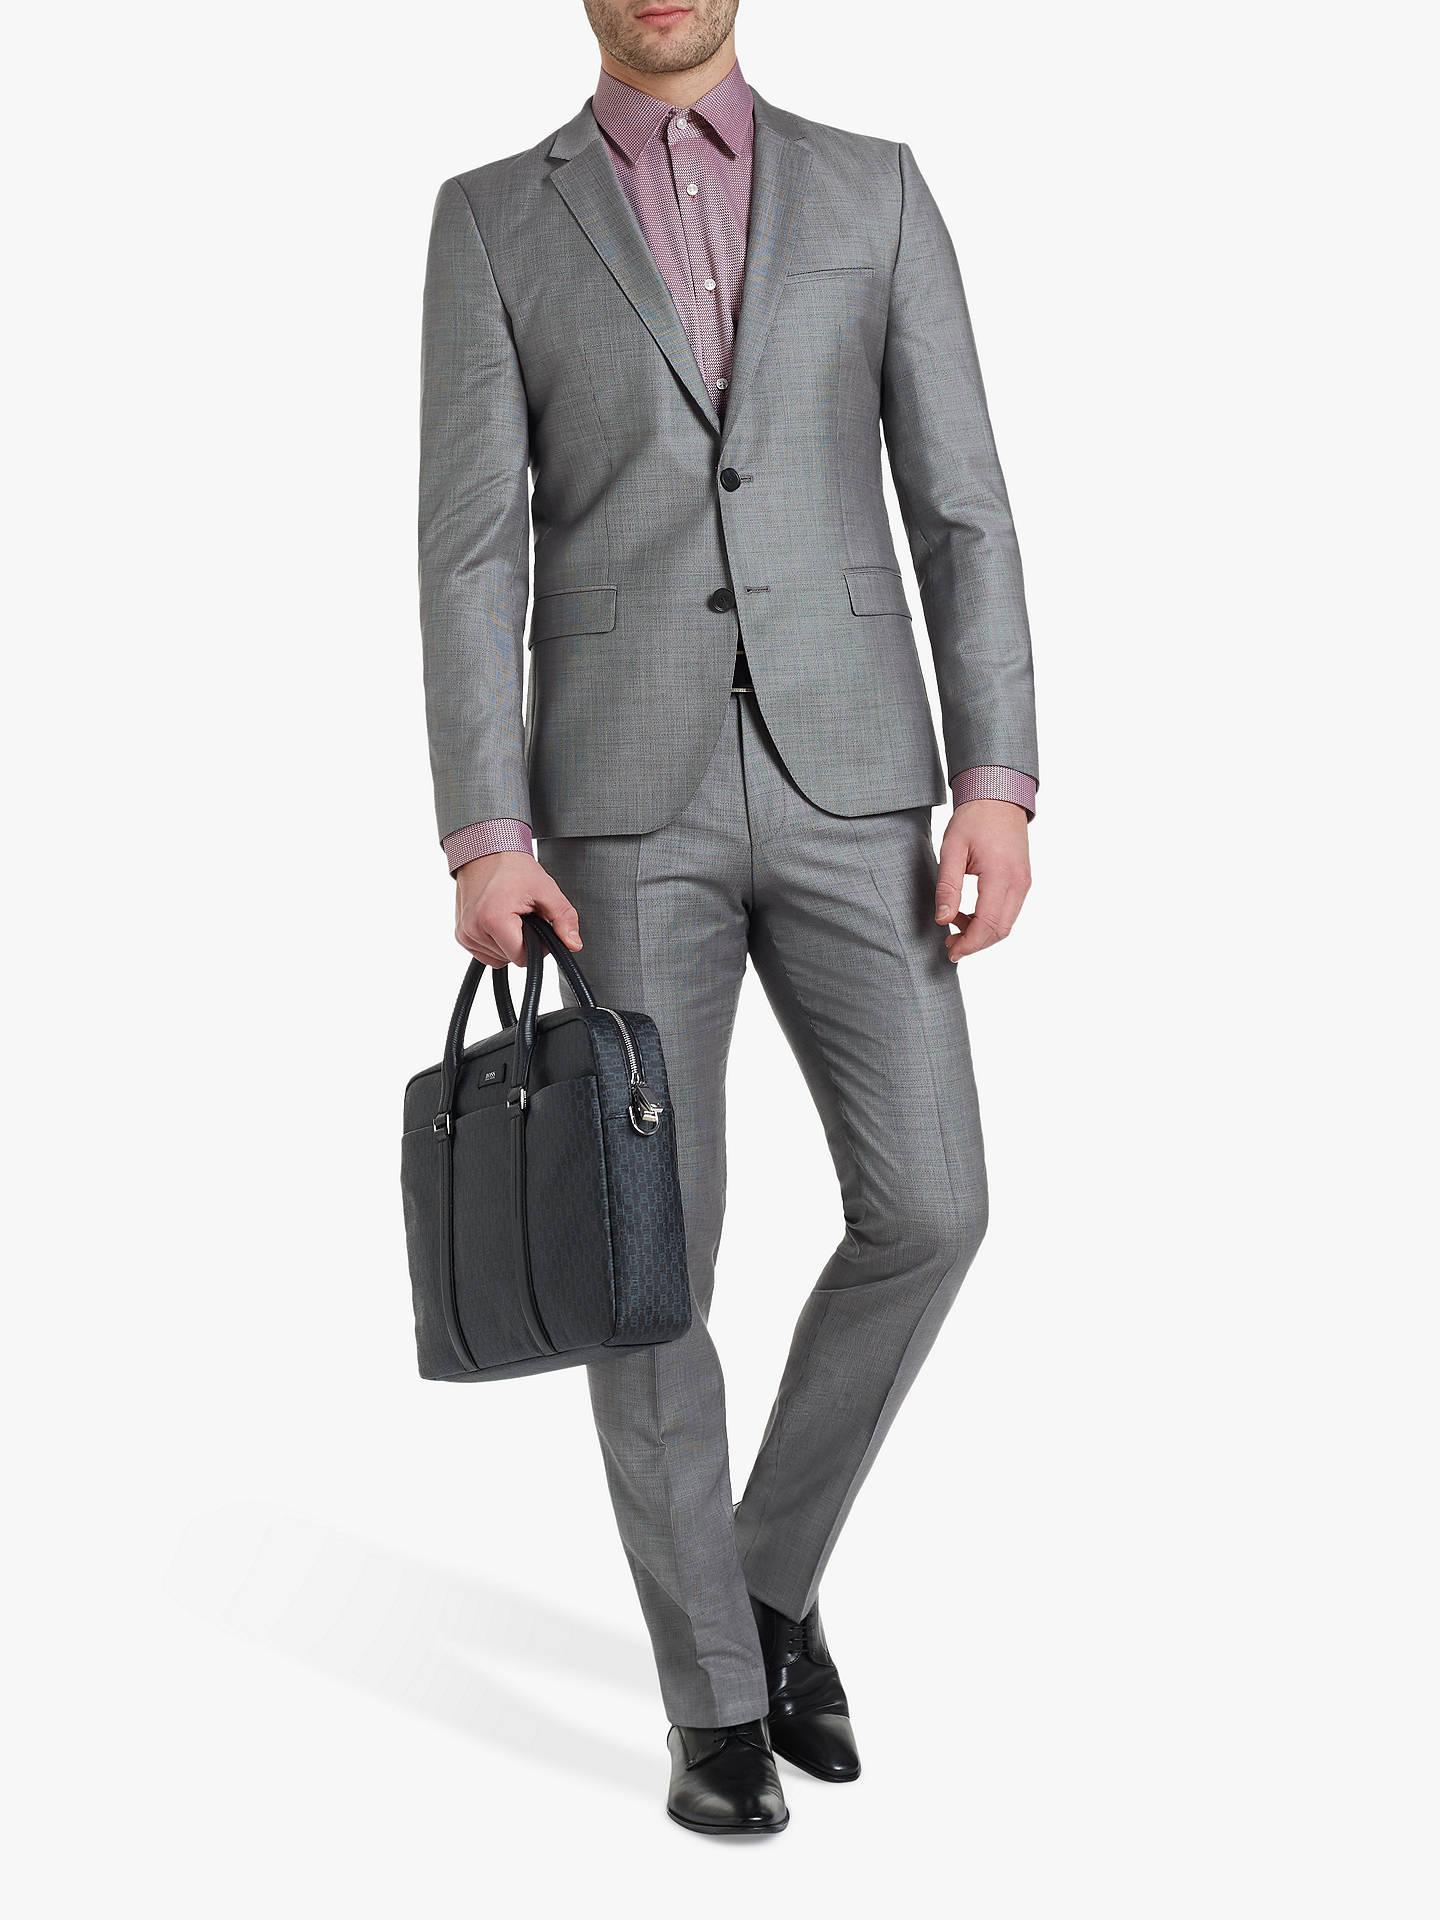 eded7079 ... Buy HUGO by Hugo Boss Hesten182 Birdseye Wool Super Slim Suit Trousers,  Grey, 32R ...